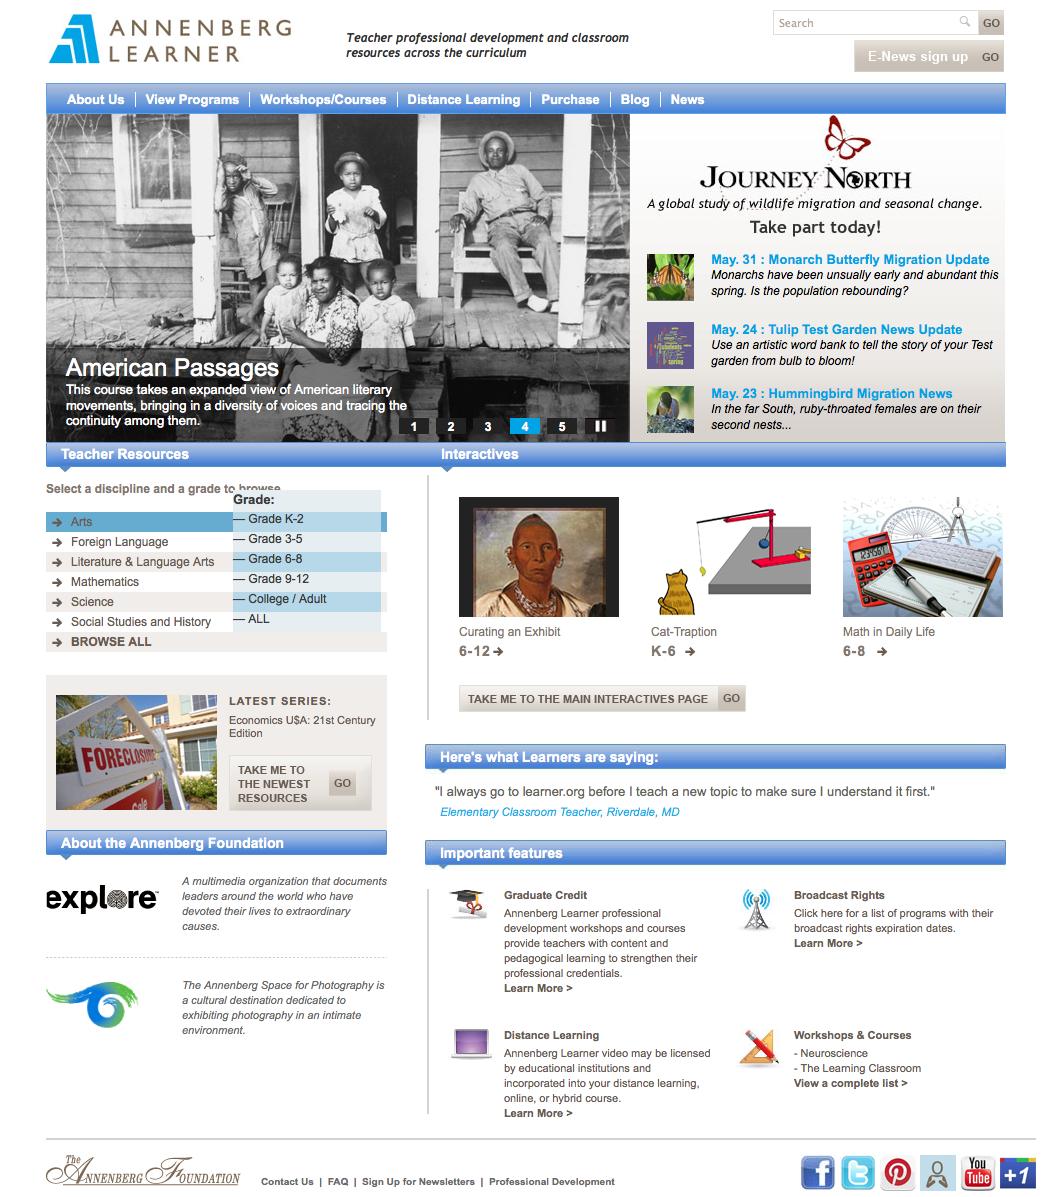 teacherlink blog learnerorg teacher professional